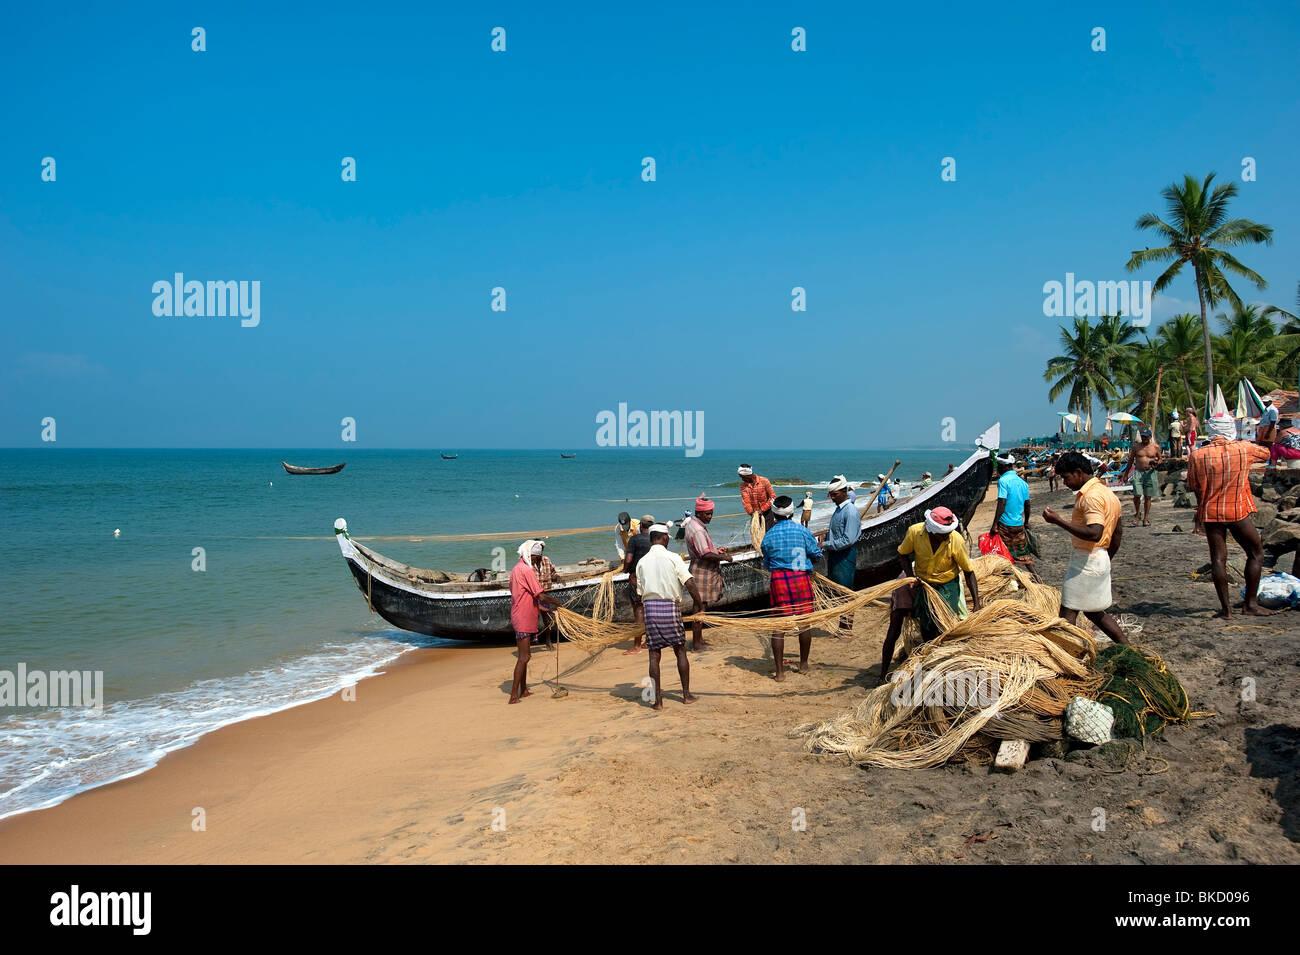 Samudra Beach with Fishermen, Kovalam, Kerala, India - Stock Image